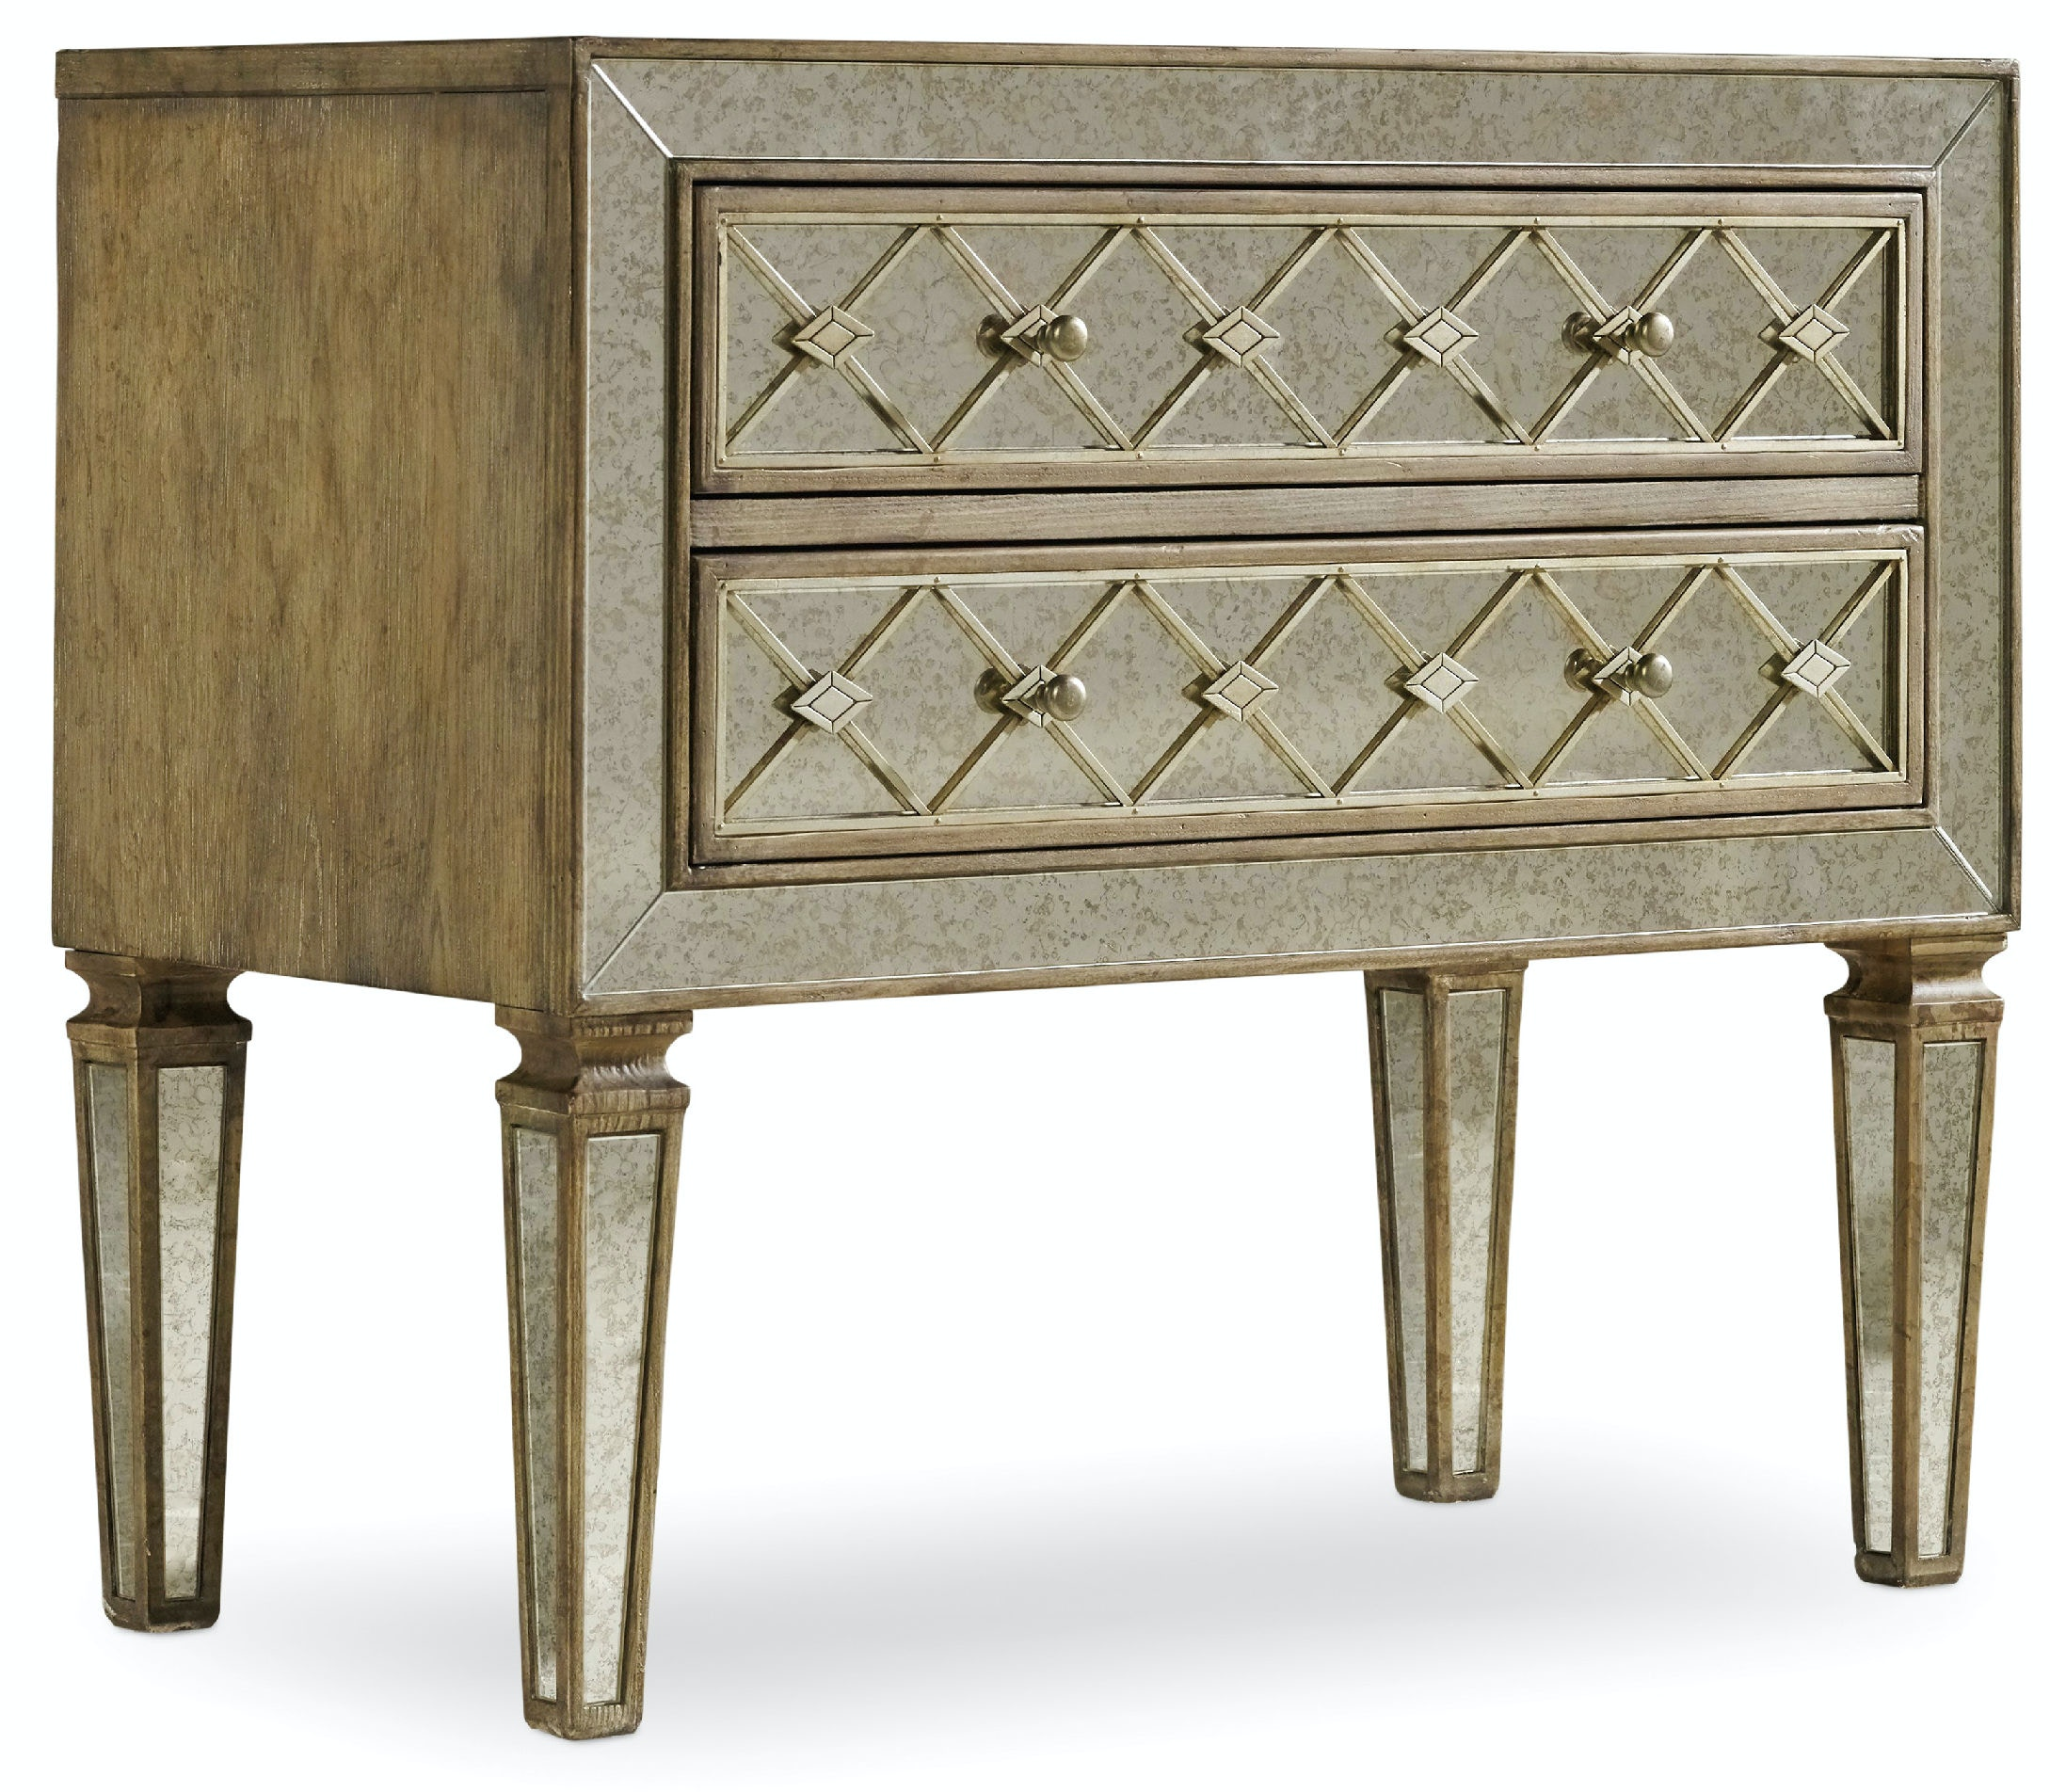 Hooker Furniture Sanctuary Bachelors Chest 5414 90017